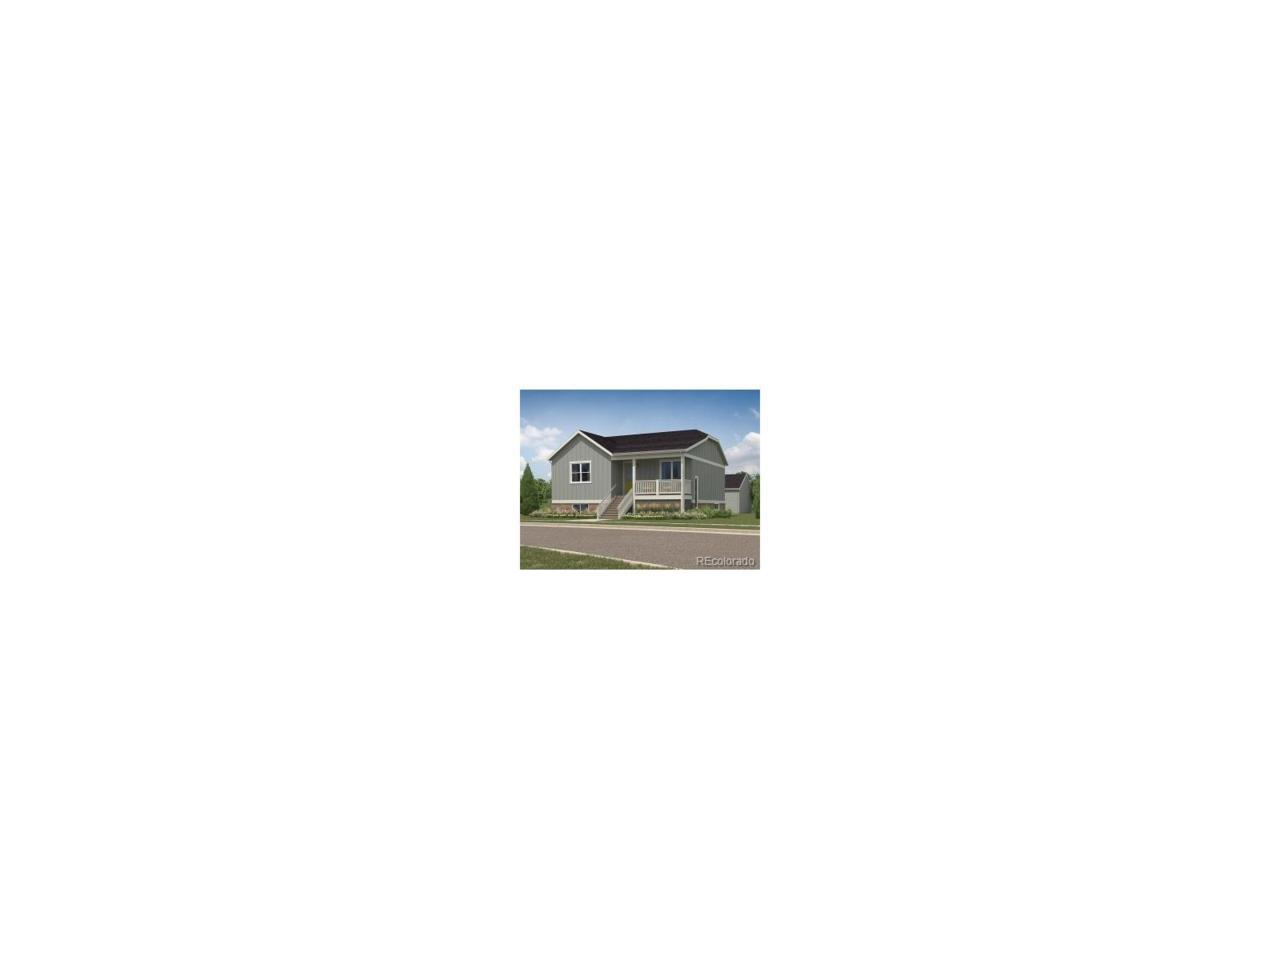 12815 Eagle River Road, Firestone, CO 80504 (MLS #8184437) :: 8z Real Estate